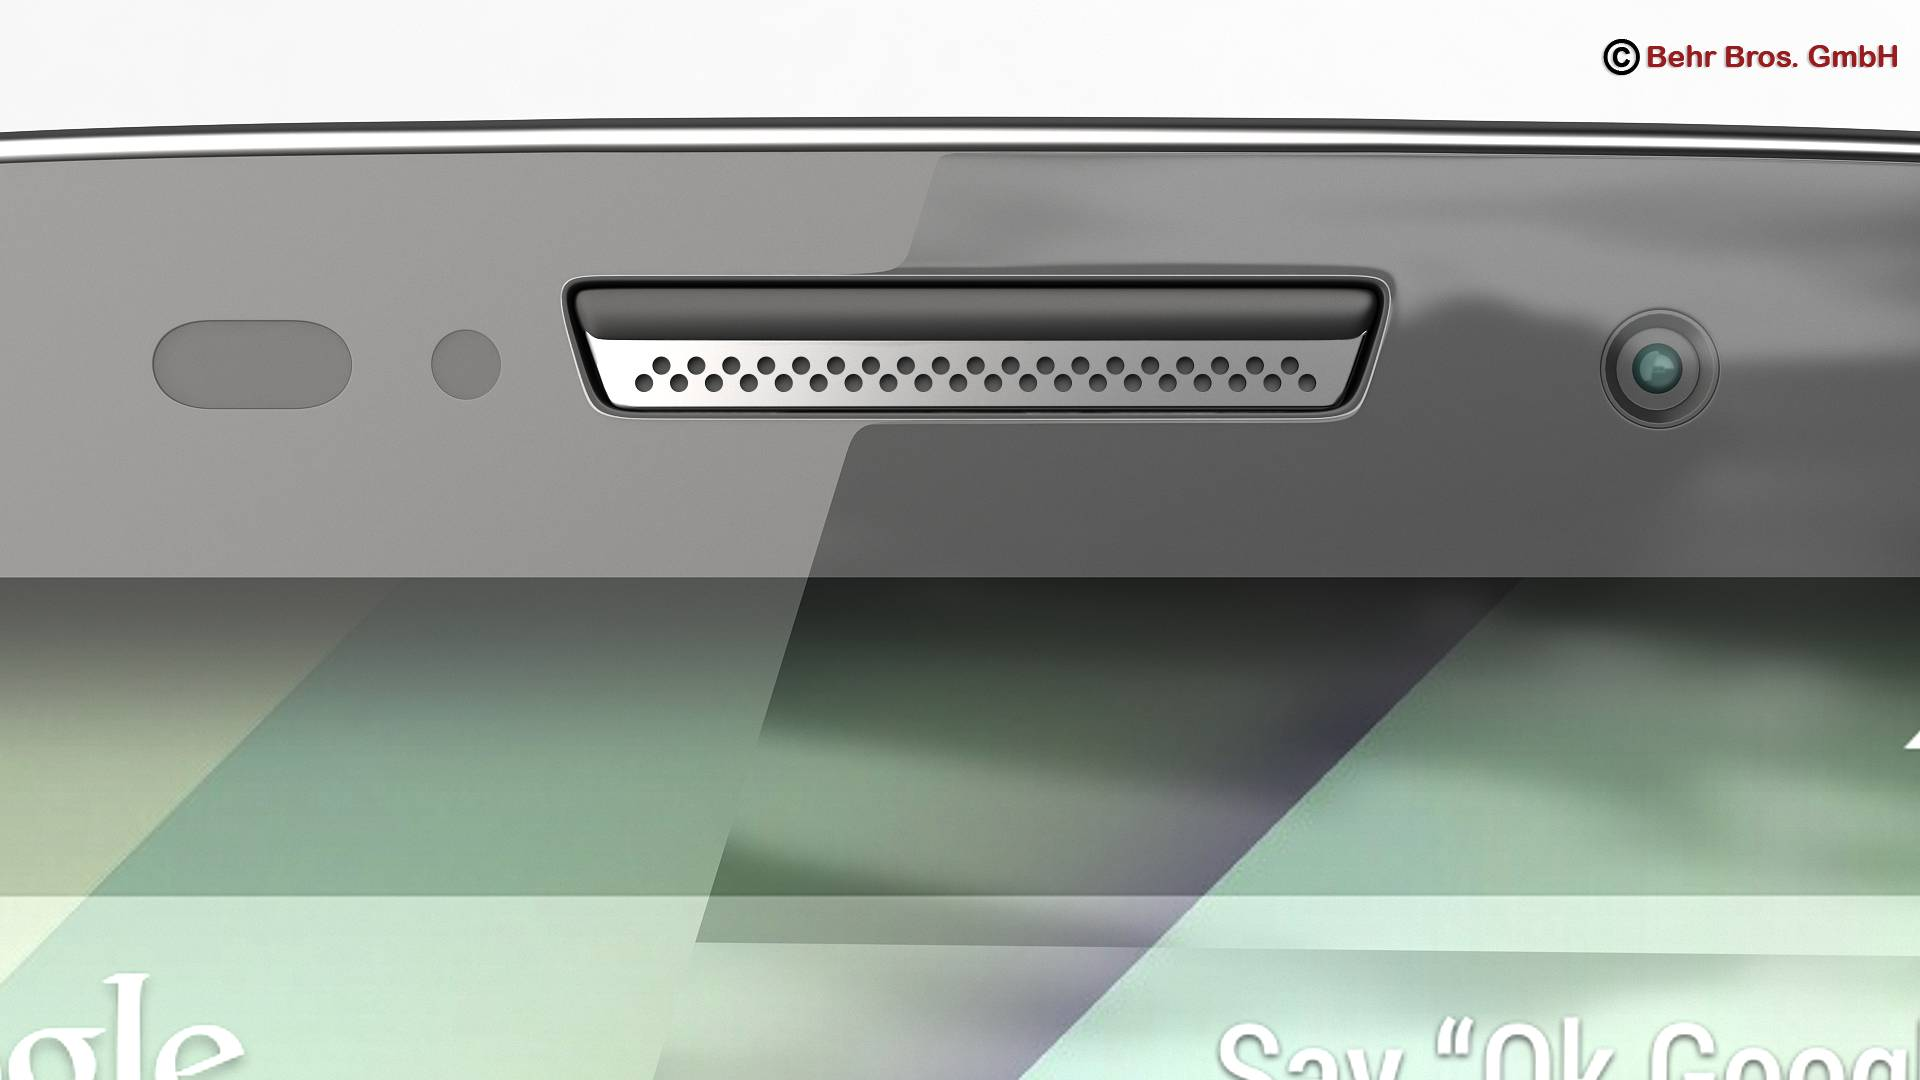 generic smartphone 5.2 inch 3d model 3ds max fbx c4d lwo ma mb obj 161655